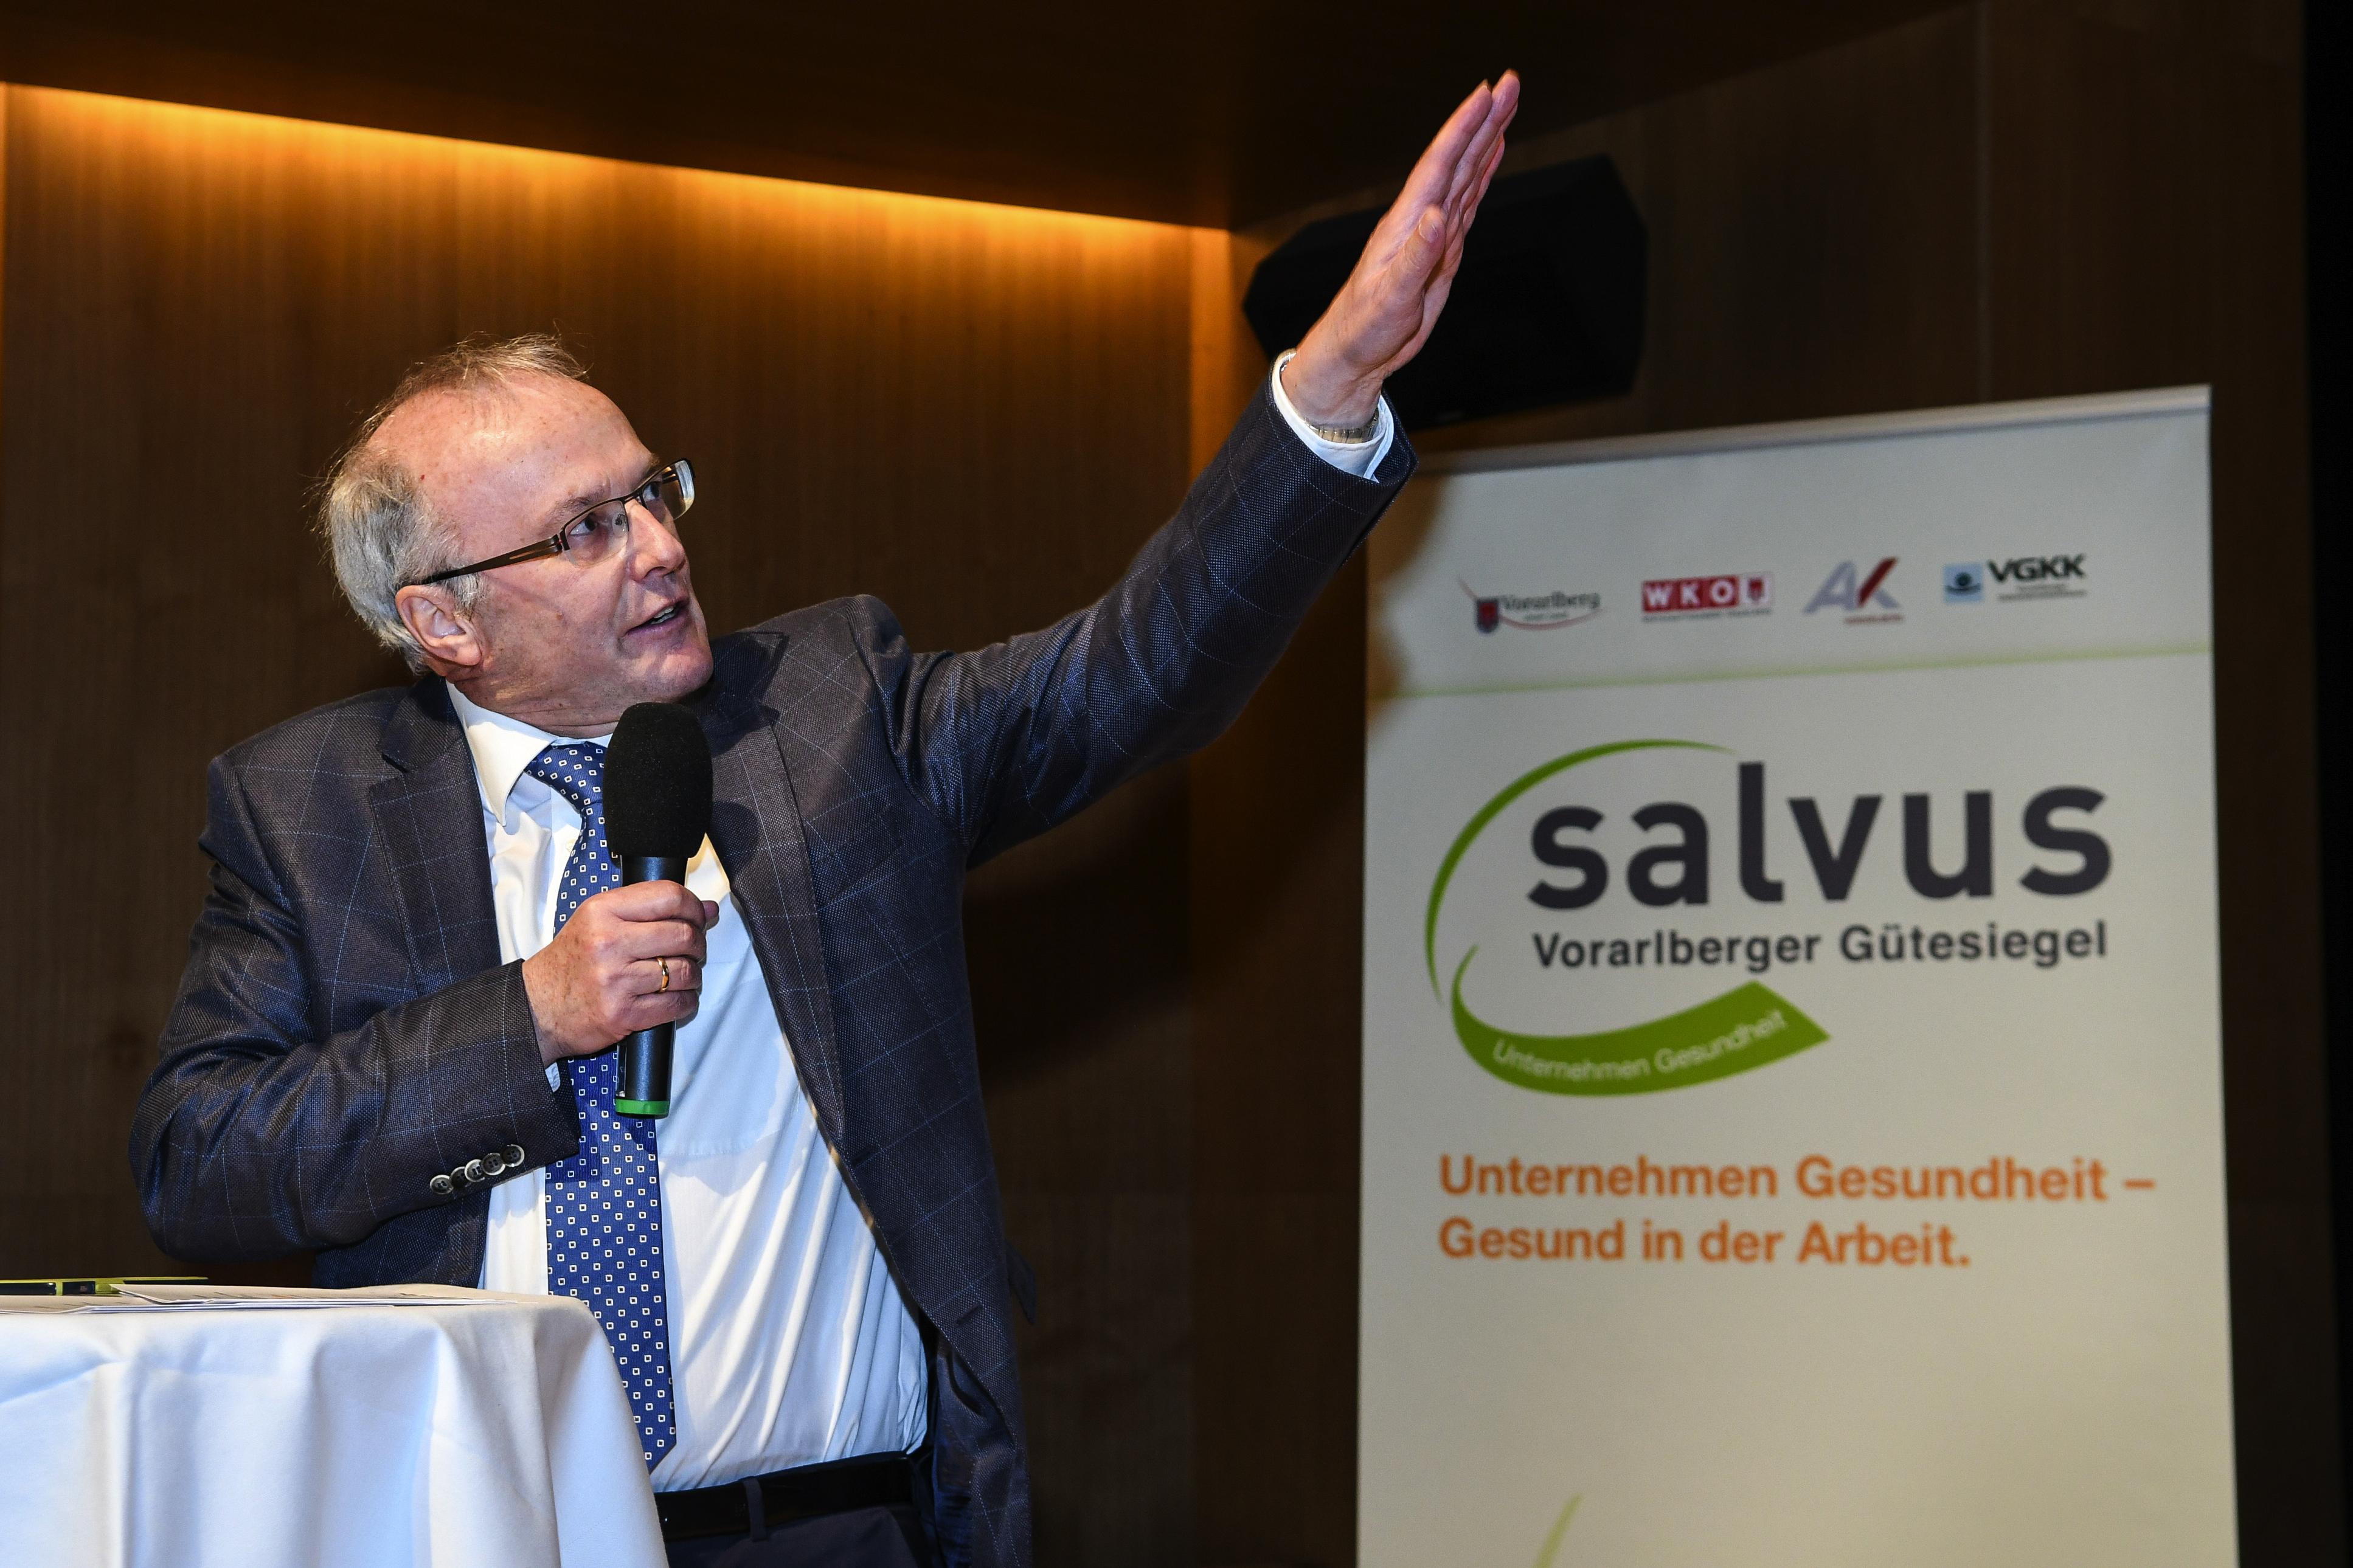 Salvus_2017_©_Udo_Mittelberger-56